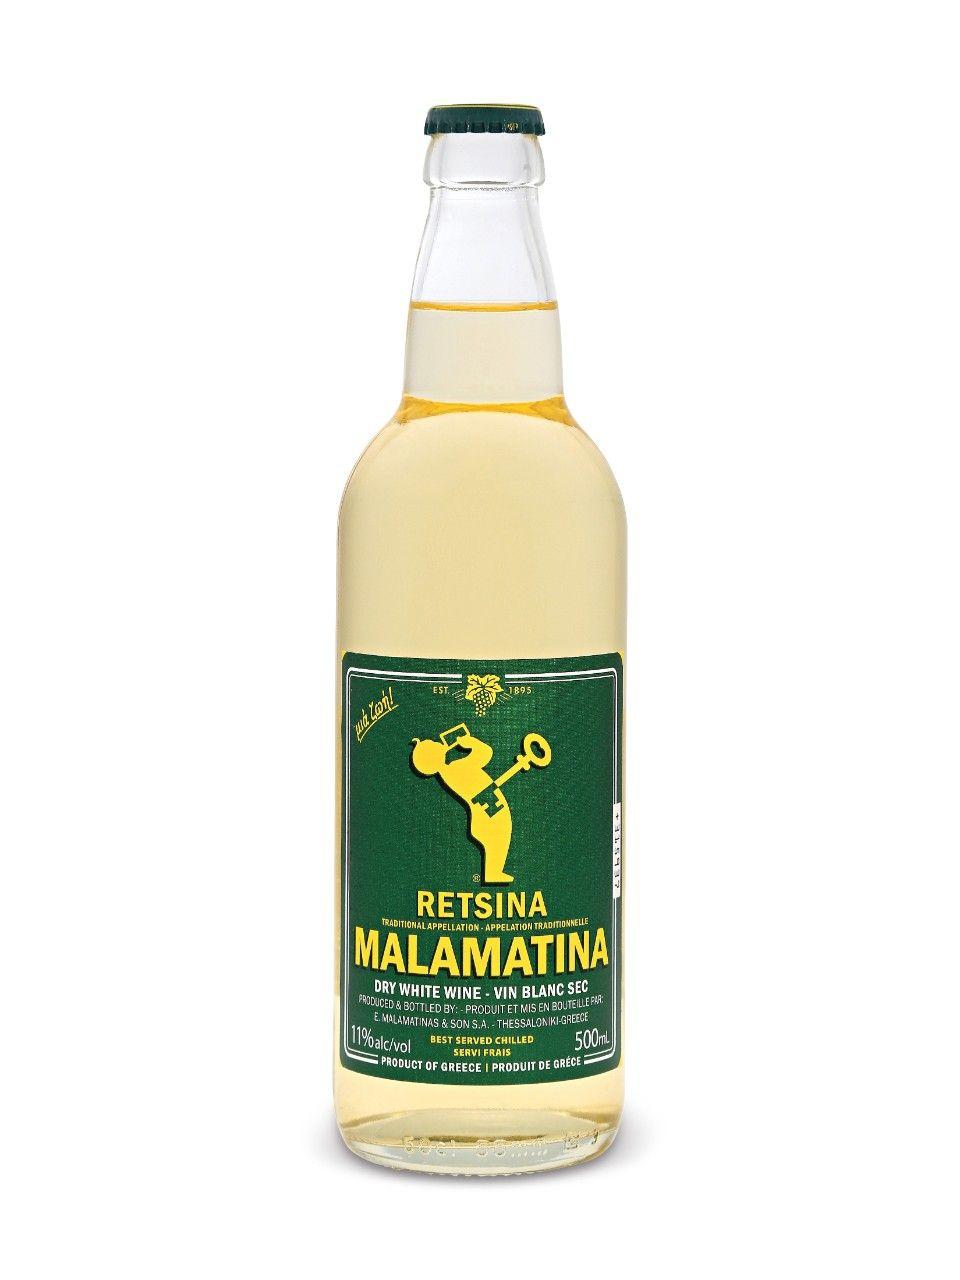 Malamatina Retsina | Corona beer bottle, Dry white wine ...